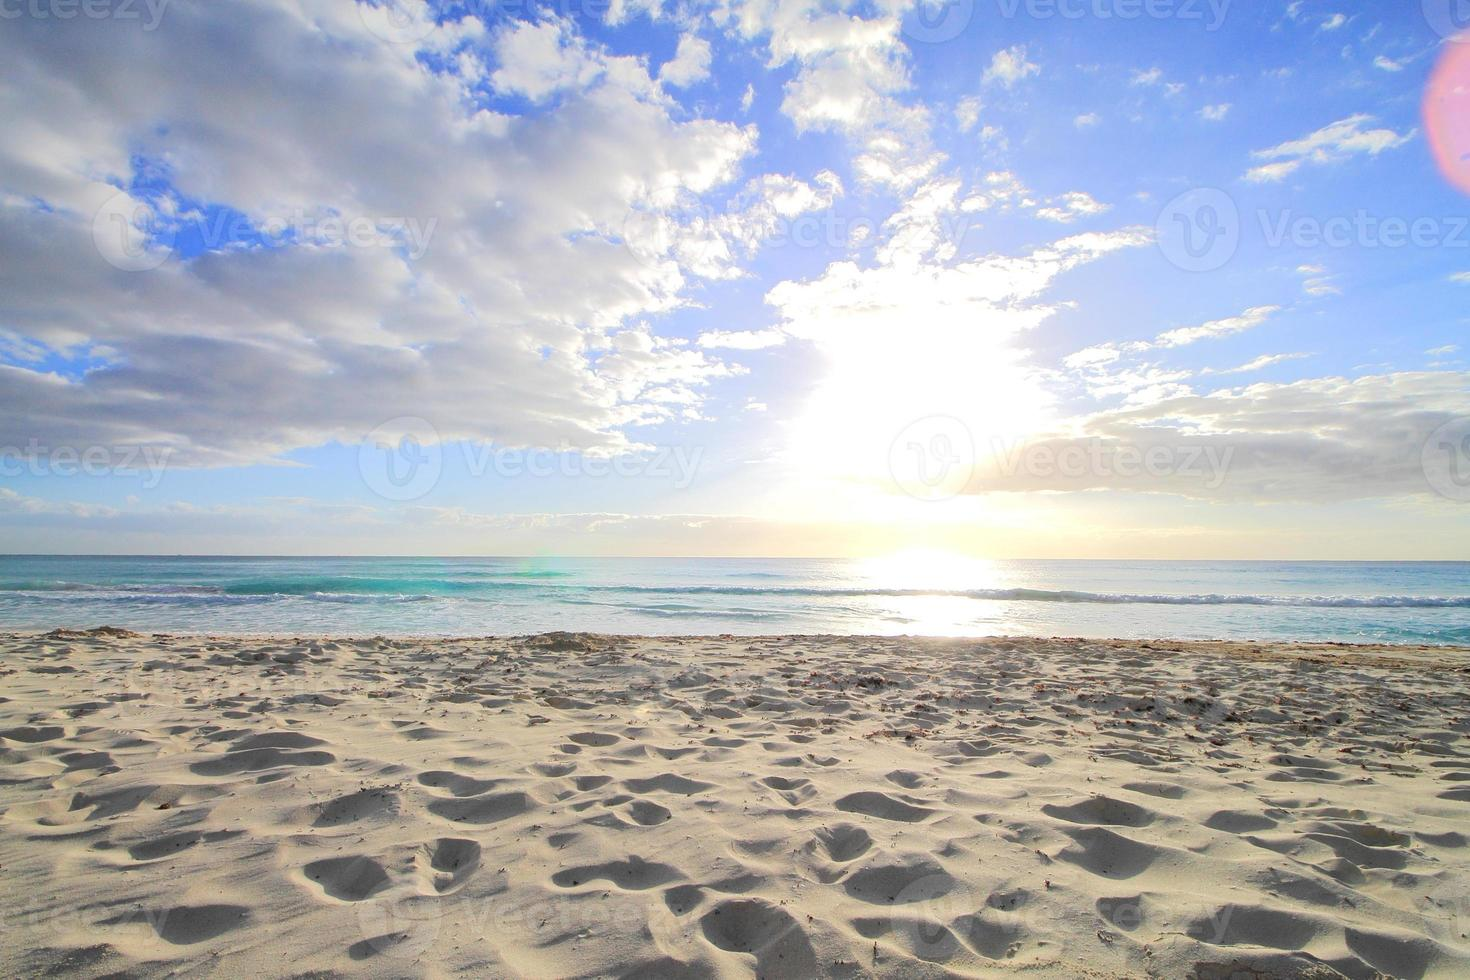 Caribbean ocean photo